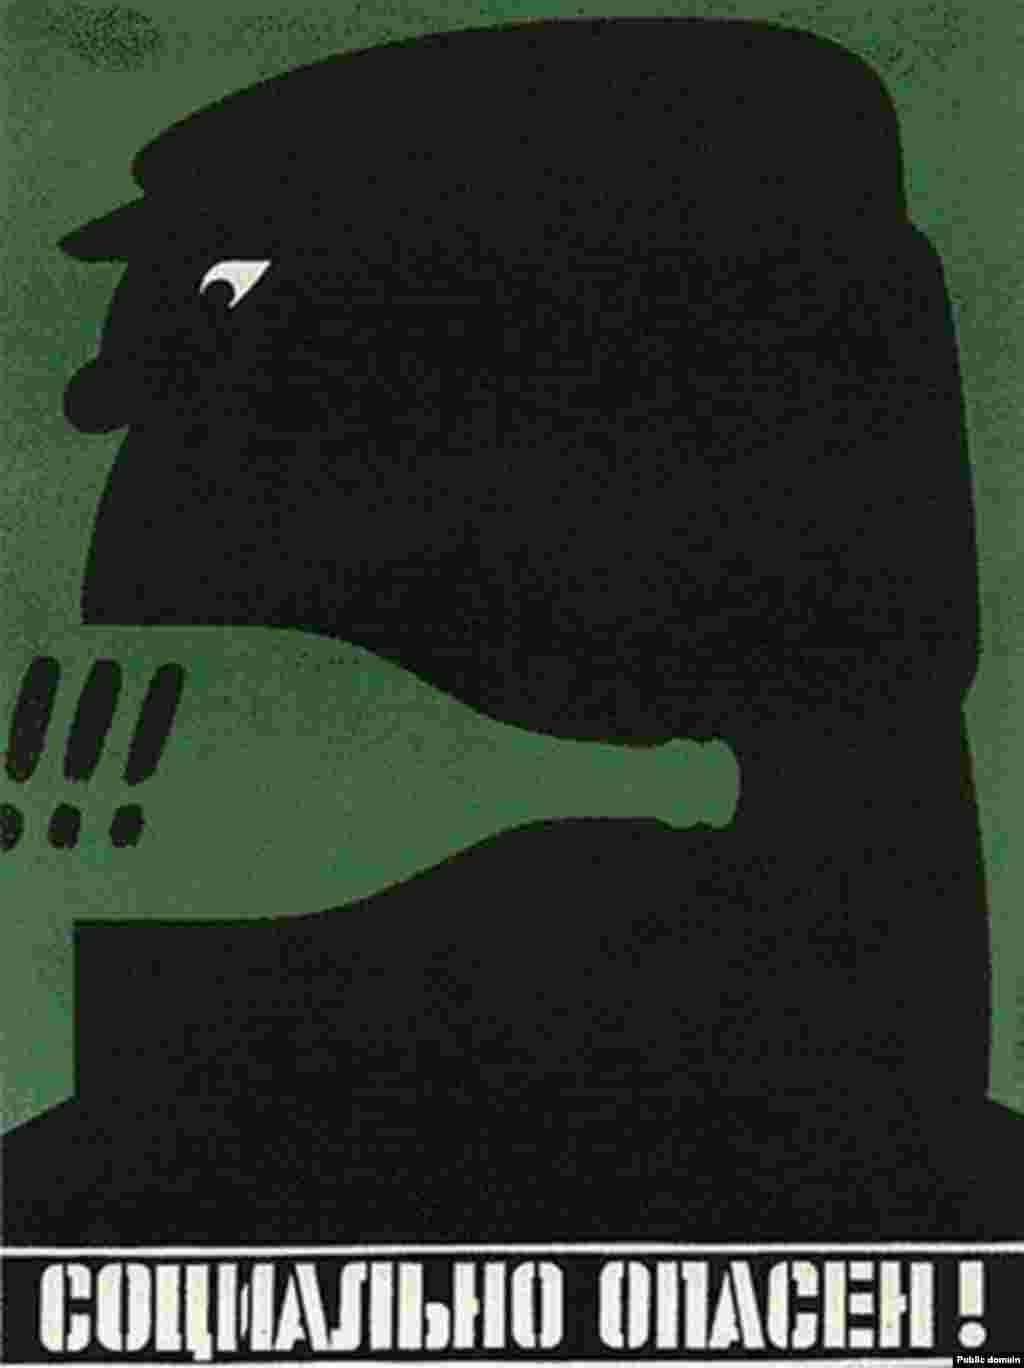 Радянський антиалкогольний плакат з 1985 року